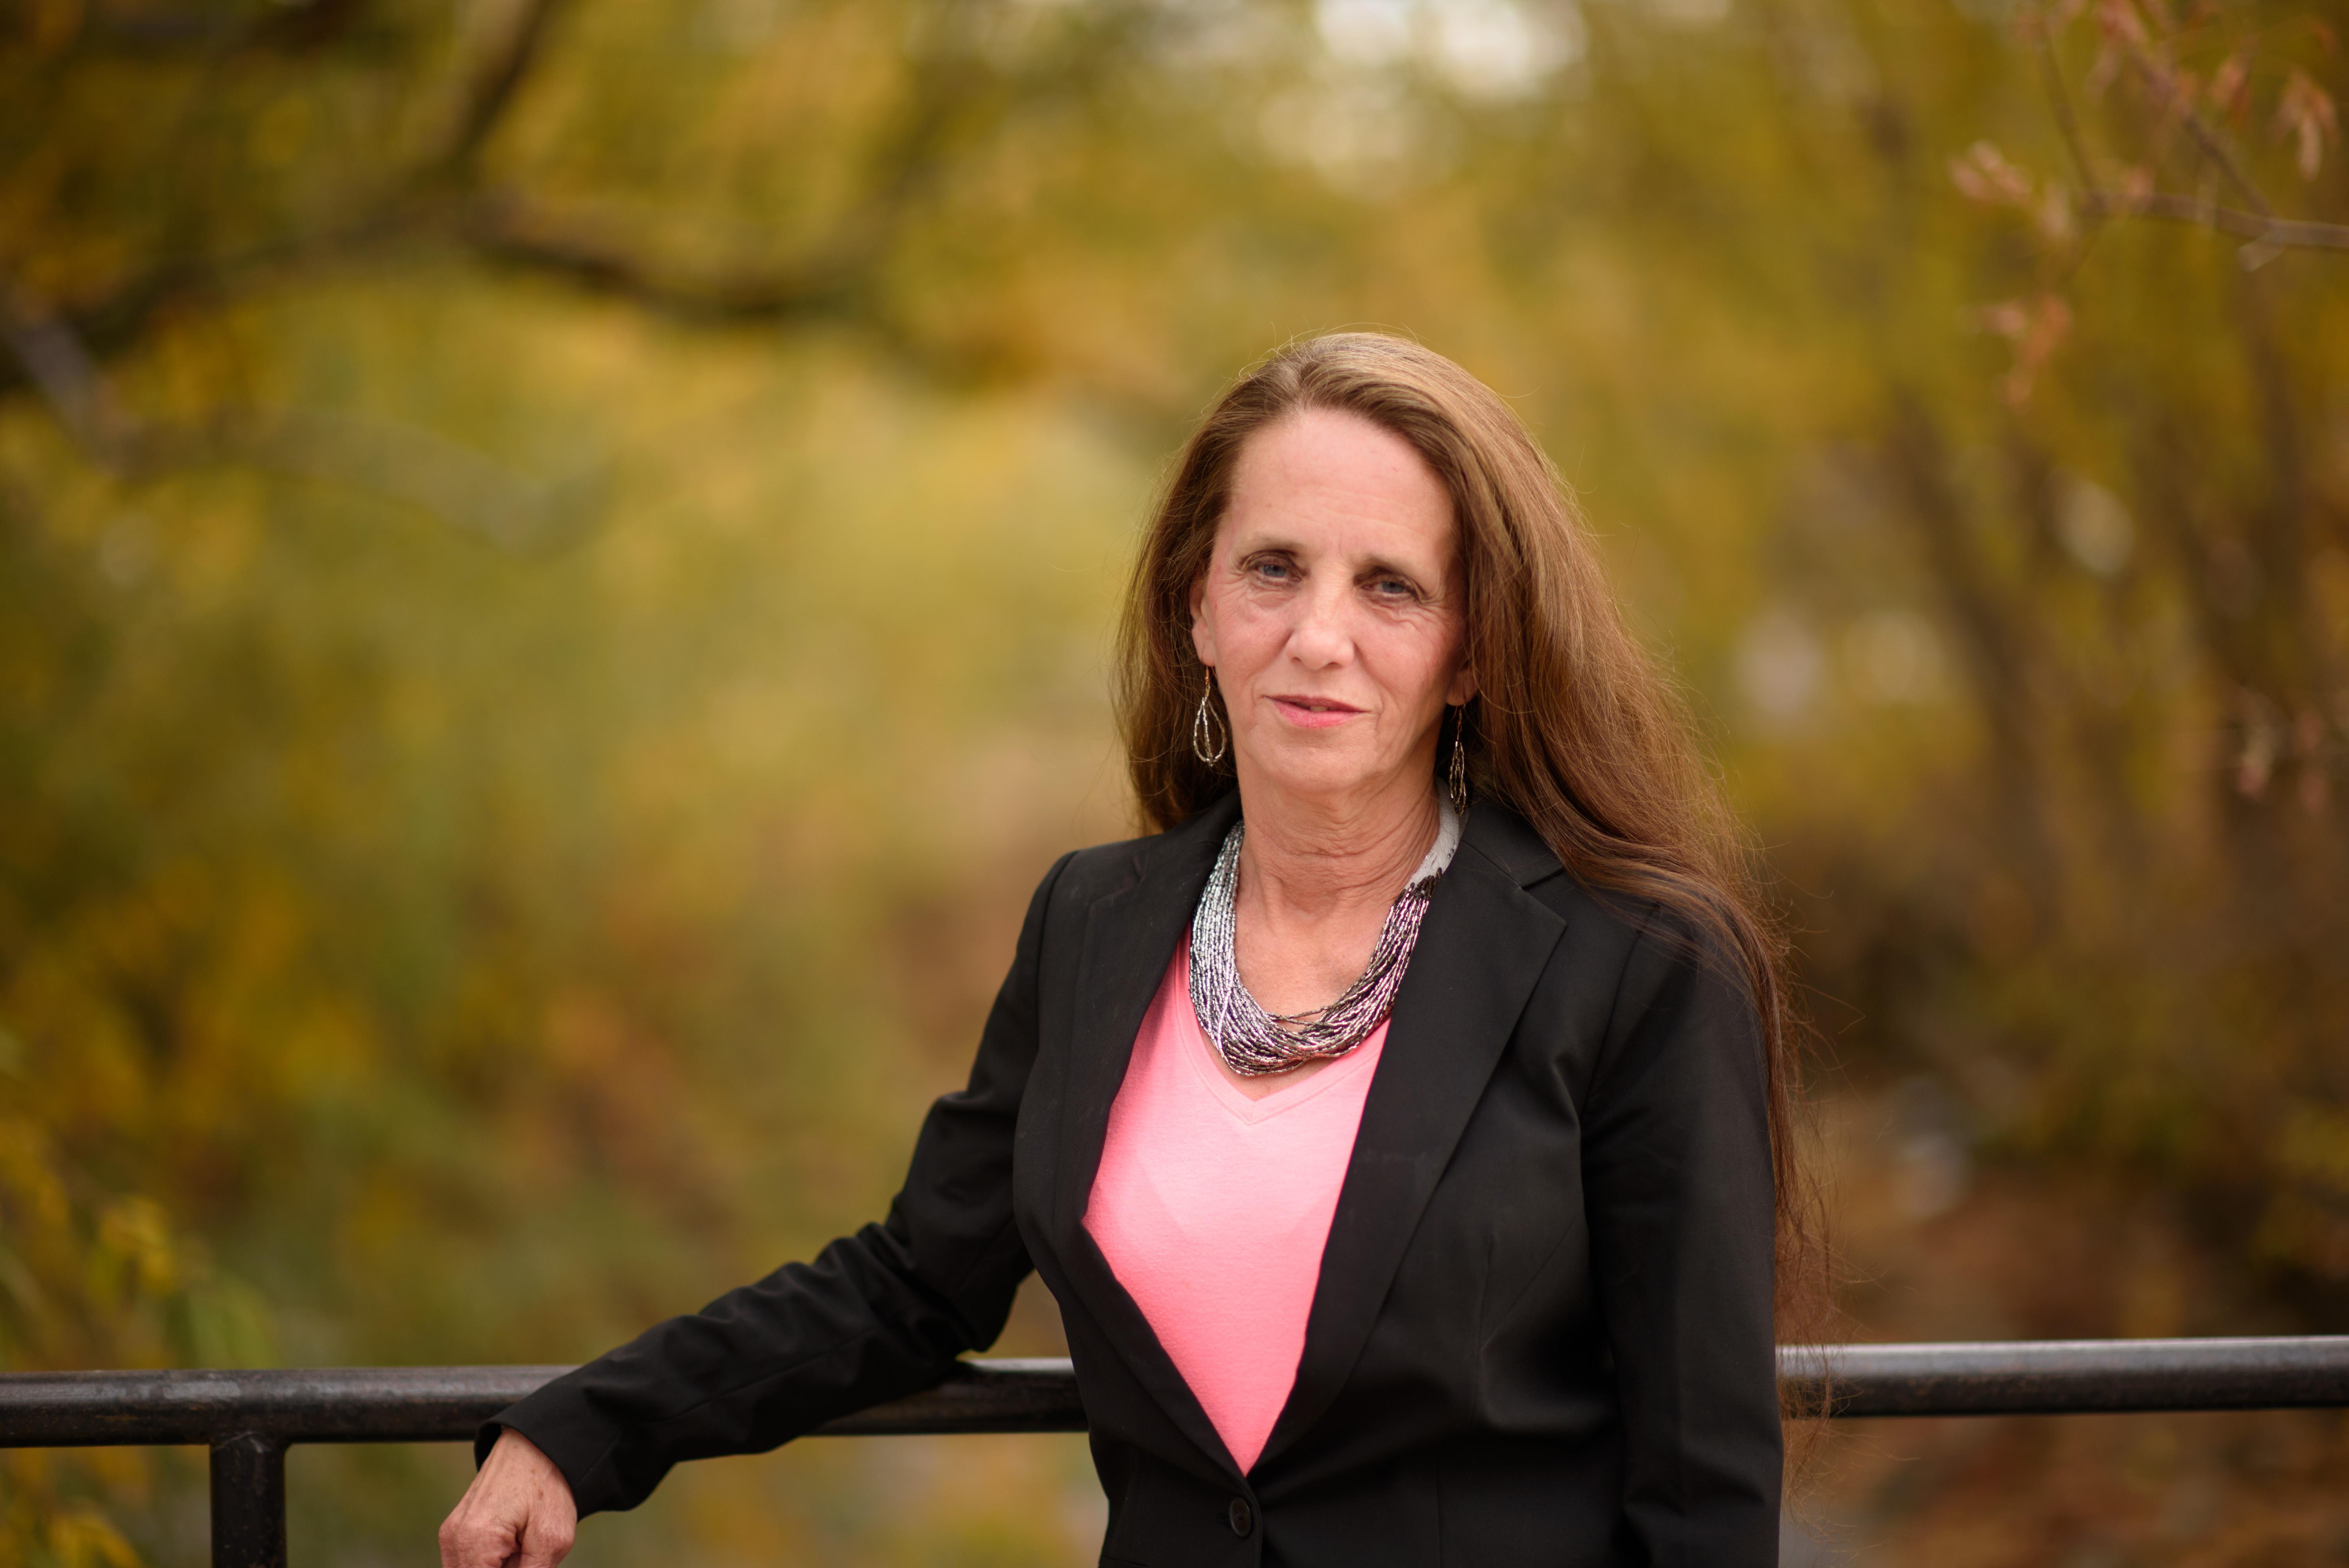 Sandra Fratto